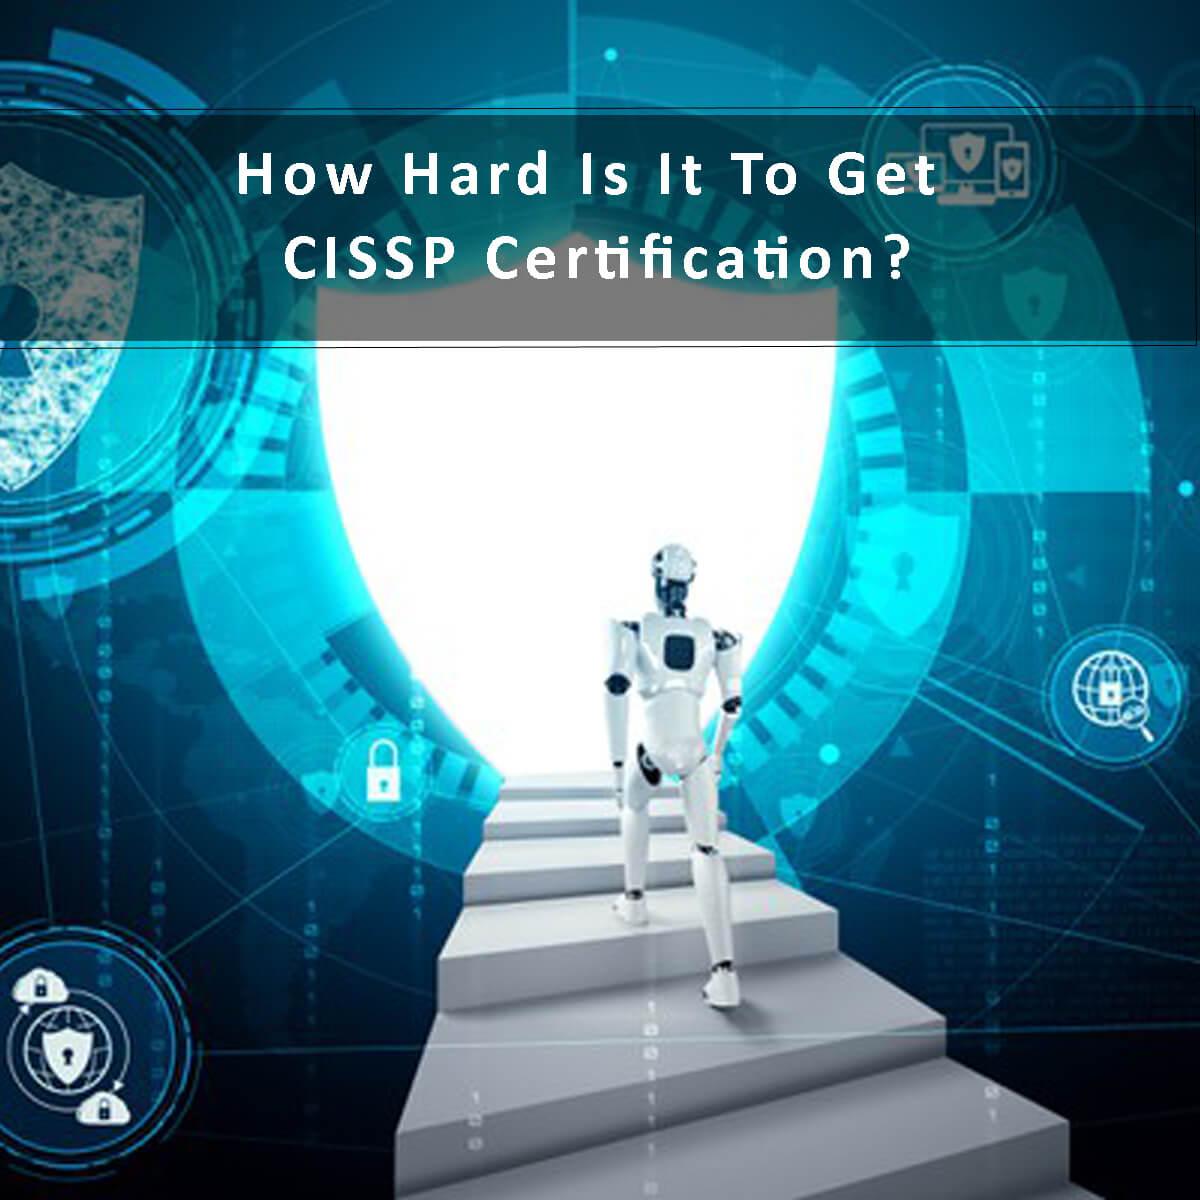 How Hard Is It To Get CISSP Certification?